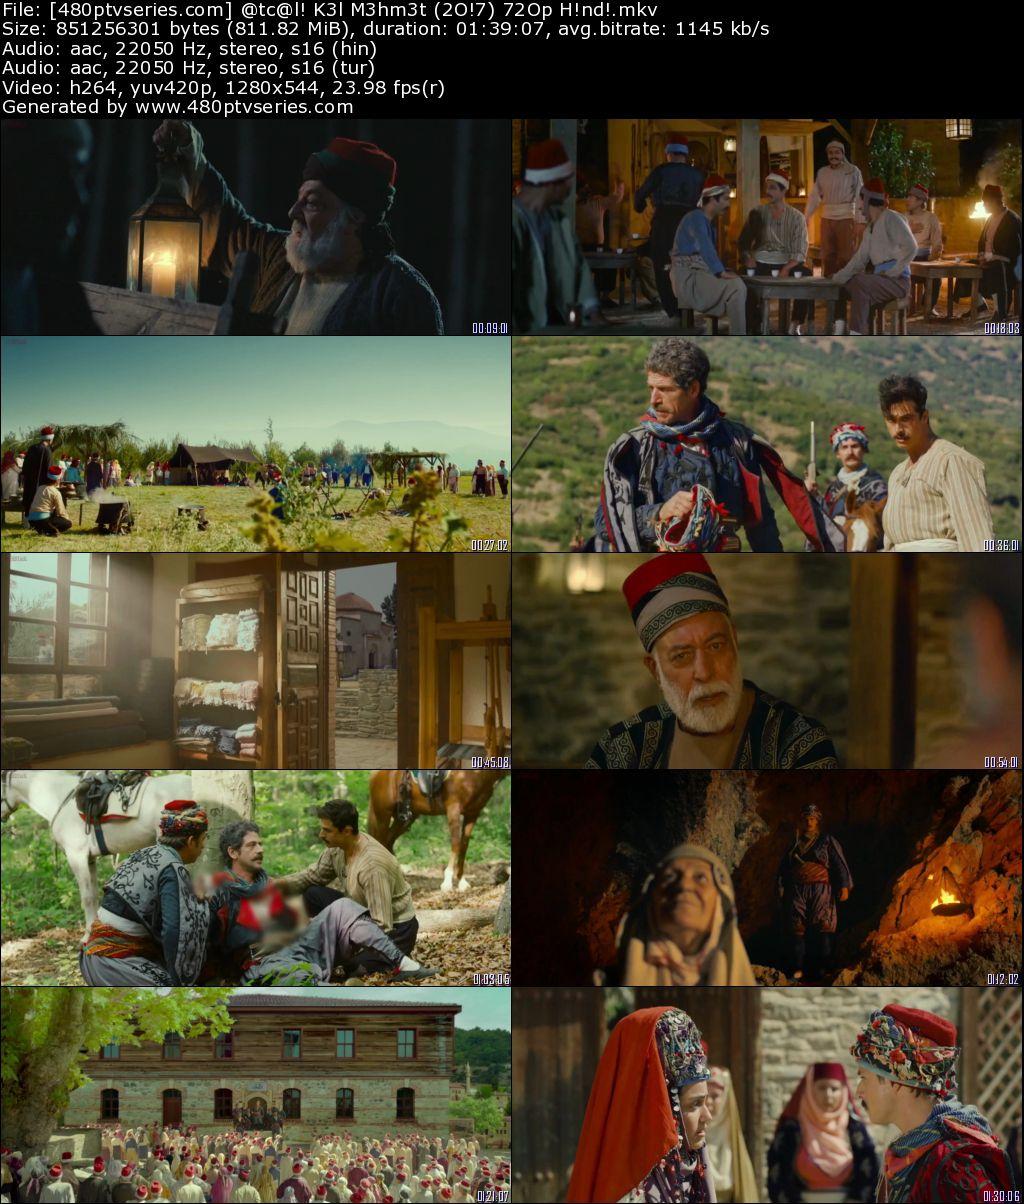 Download Atçali Kel Mehmet (2017) 800MB Full Hindi Dual Audio Movie Download 720p HDTVRip Free Watch Online Full Movie Download Worldfree4u 9xmovies